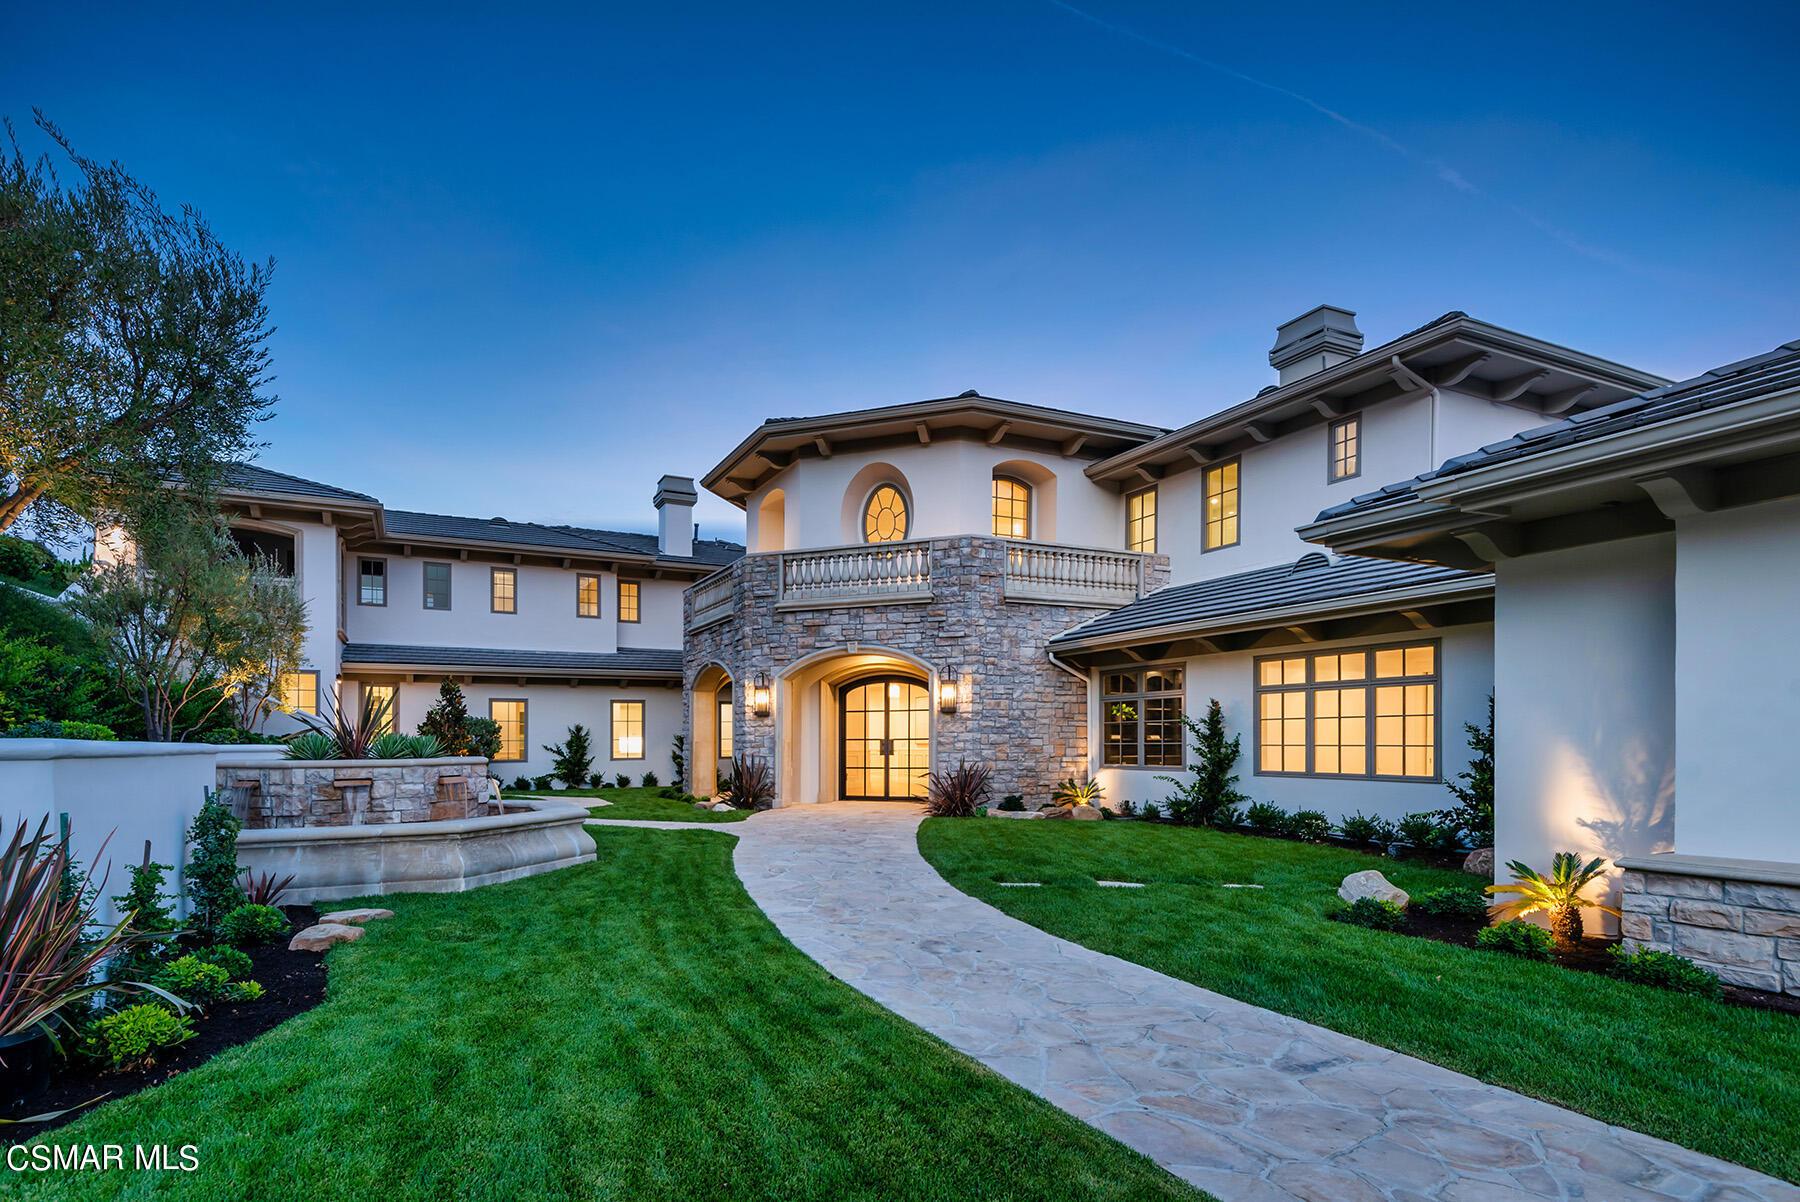 Photo of 949 Brook Meadow Court, Westlake Village, CA 91362